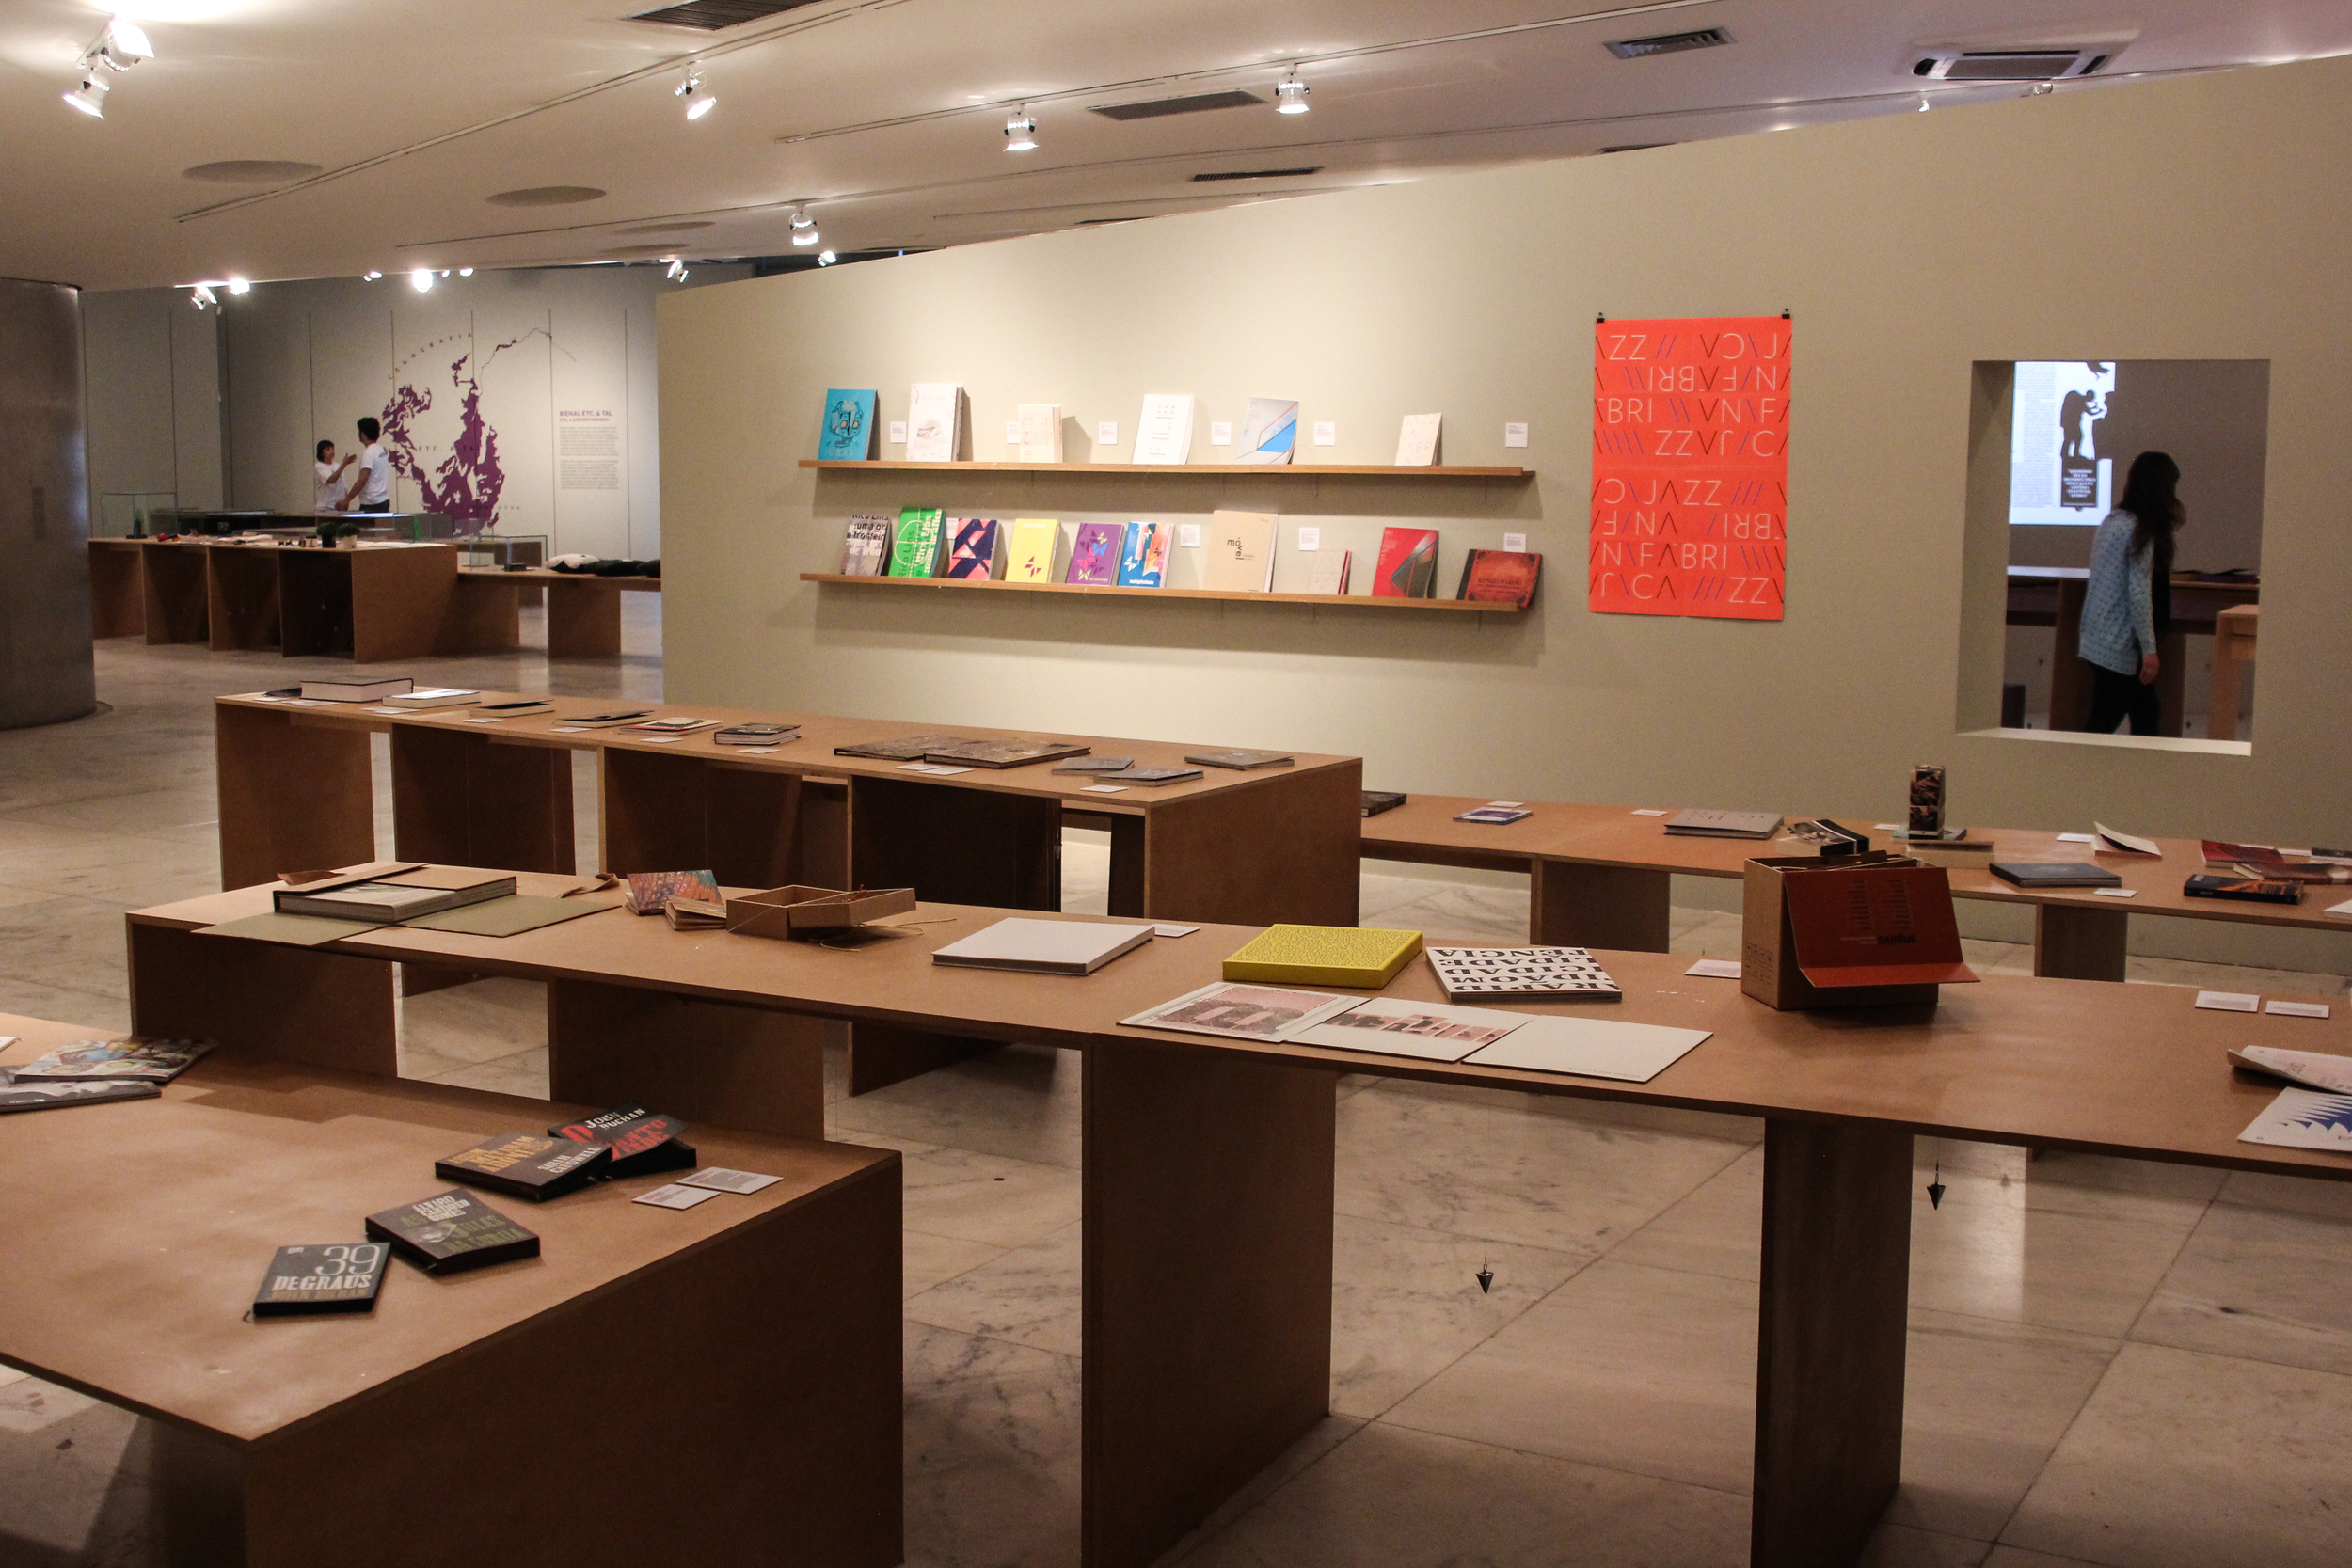 06 BienalADG d.2 -173.jpg